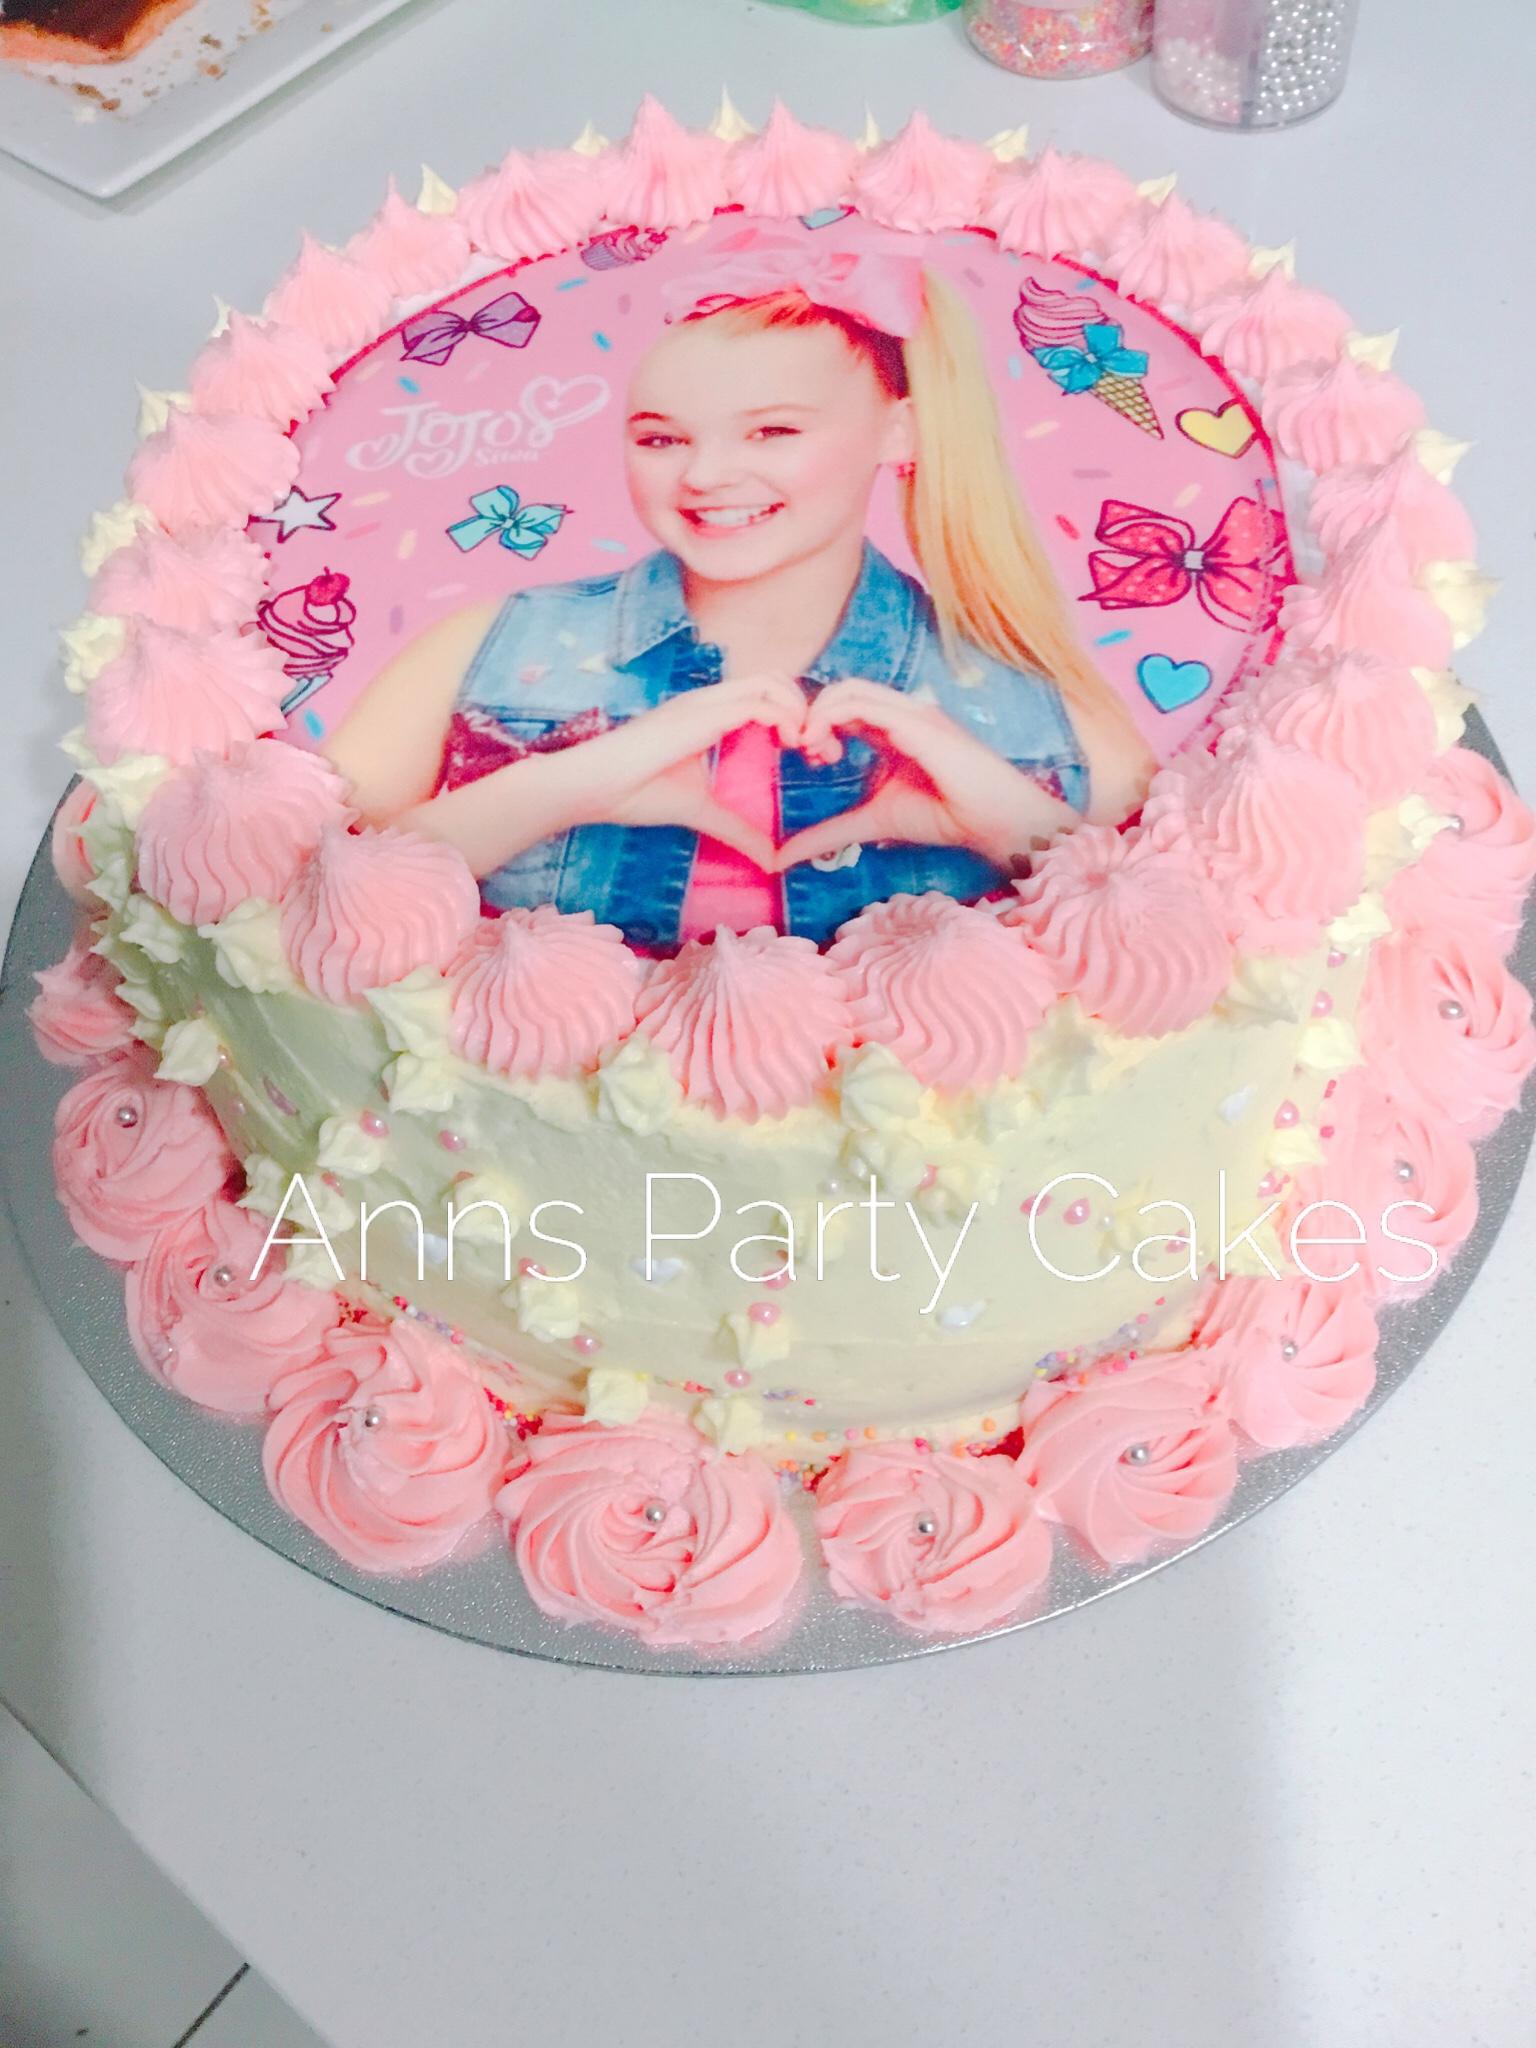 Jo jo Siwa cake decoration/ Jojo Siwa Party Cake \u2013 AFRICAN